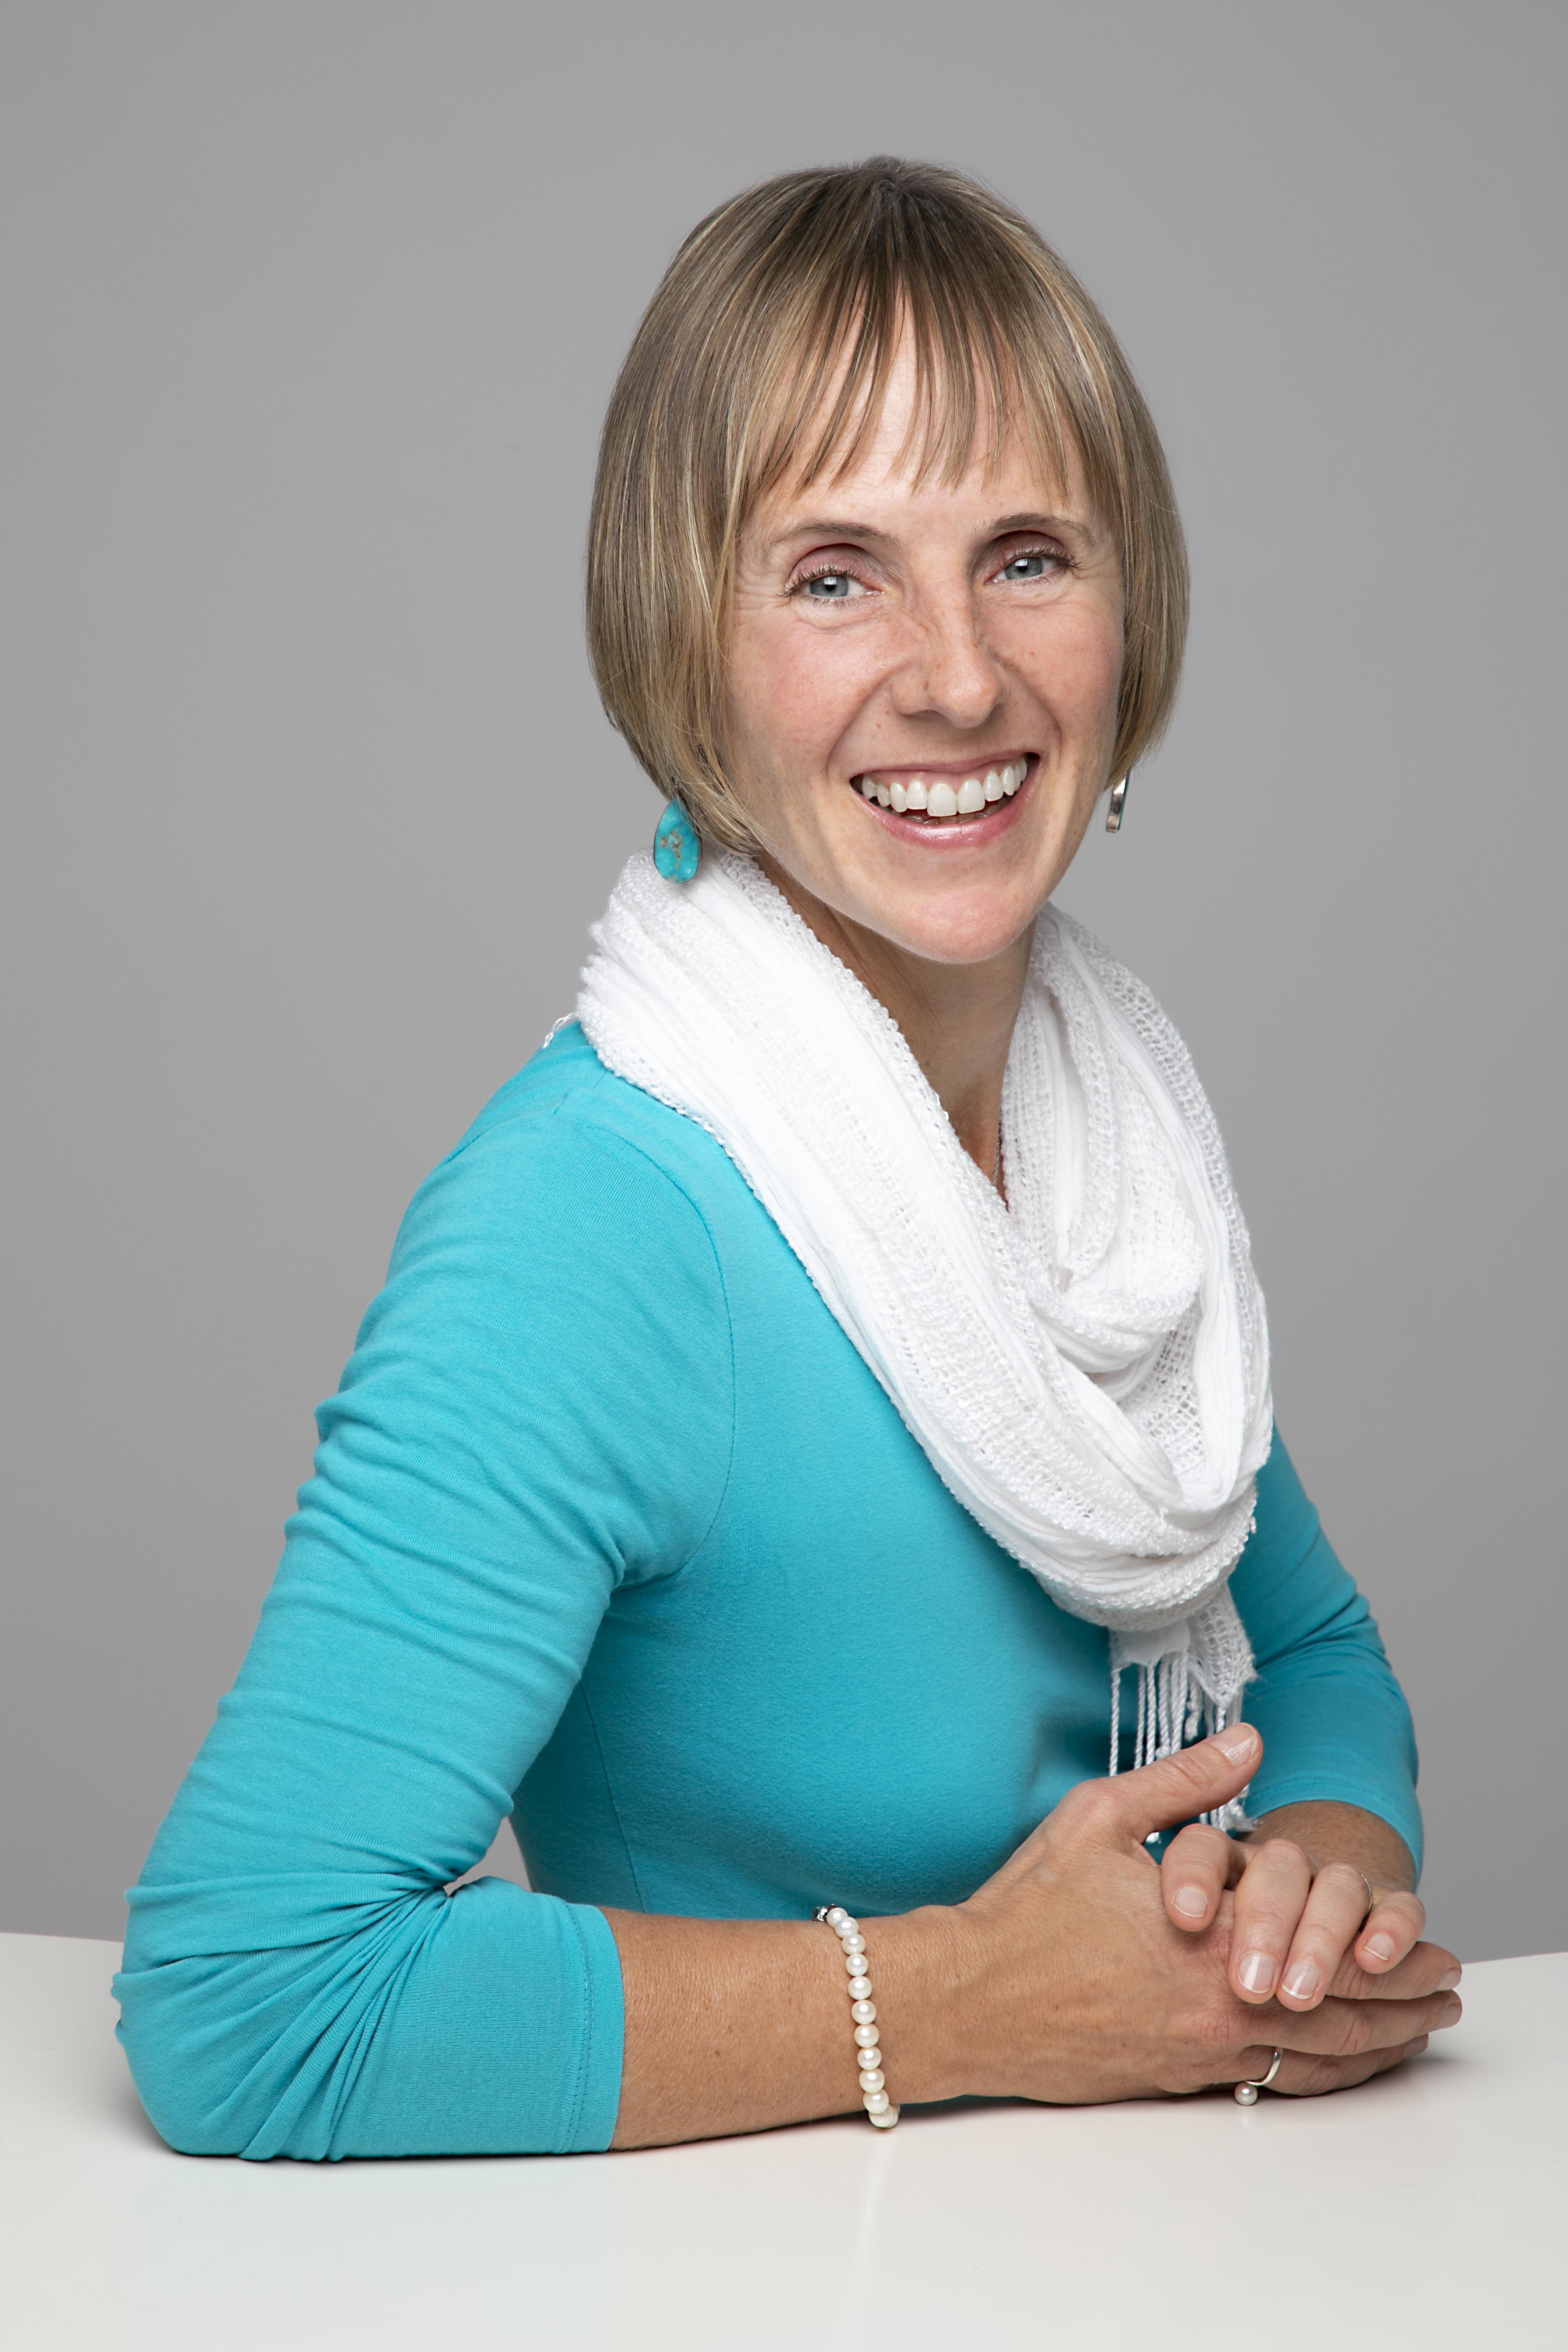 Sonia Weirich